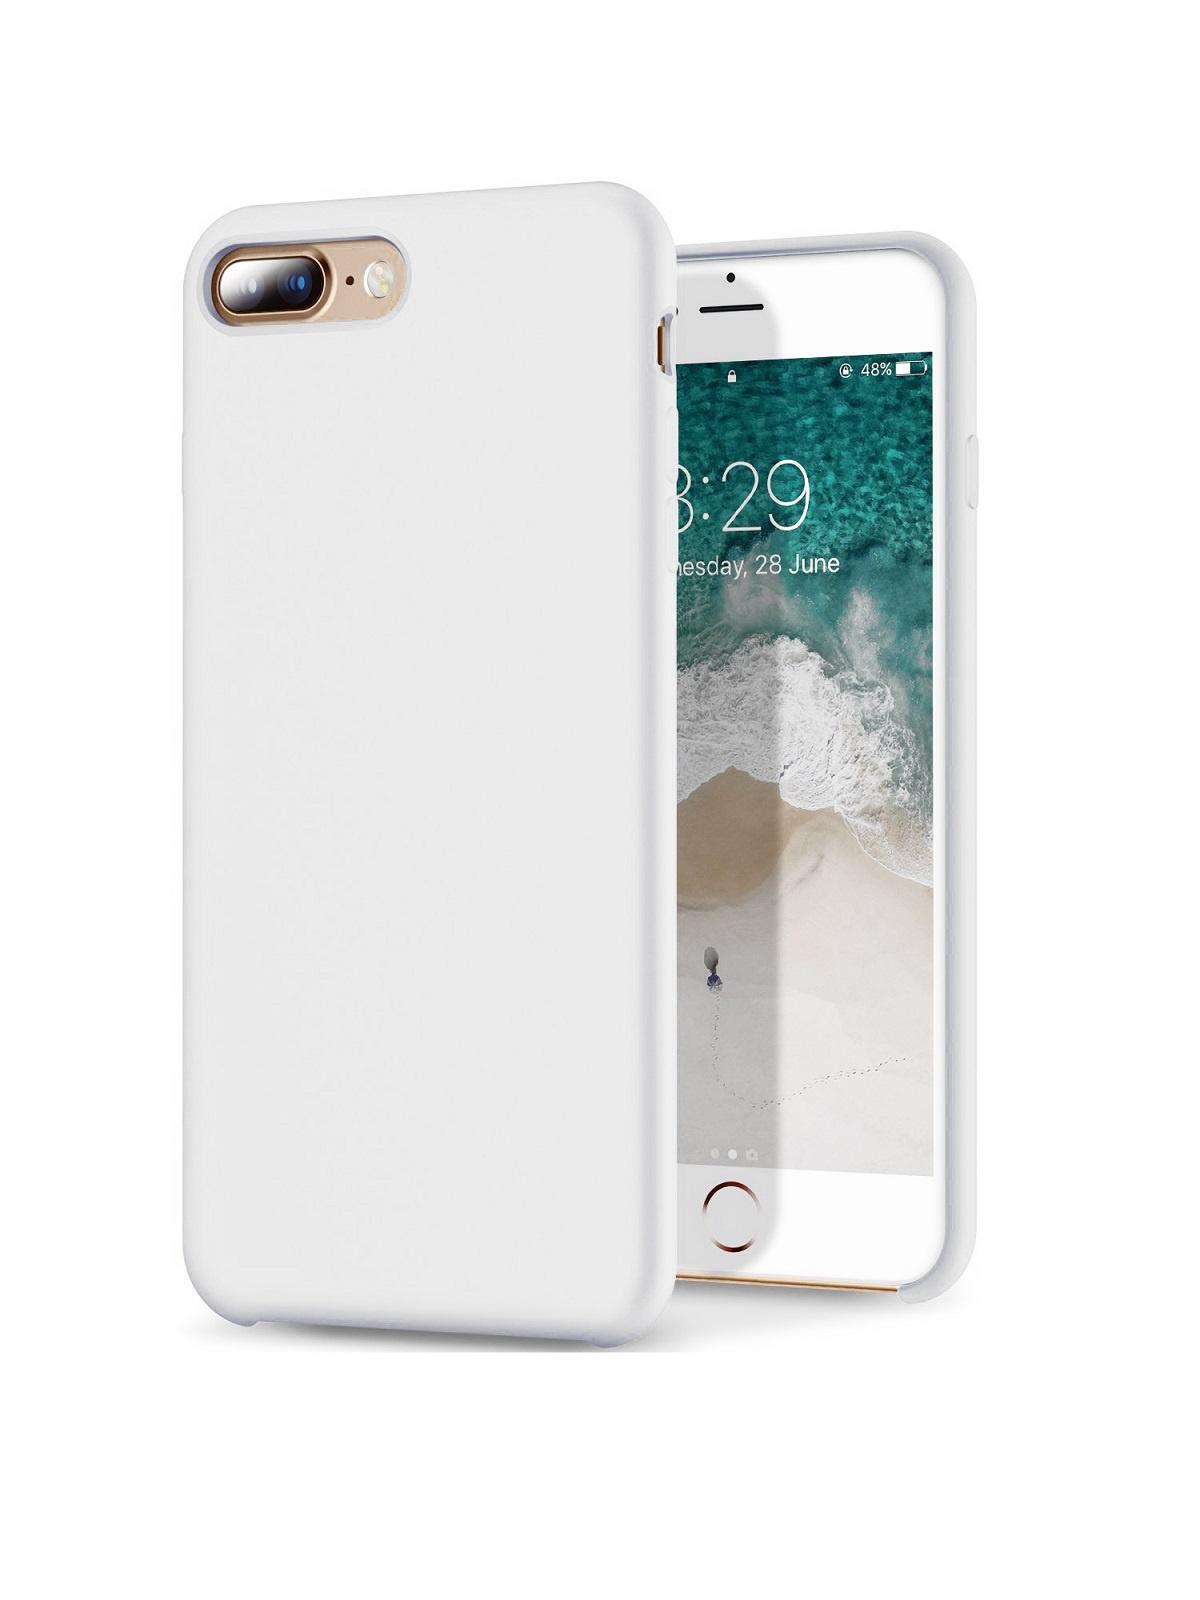 Чехол/бампер Yoho для iPhone 7 Plus/8 Plus, YCHI78PW, белый чехол бампер yoho для iphone 7 8 ychi78qw белый